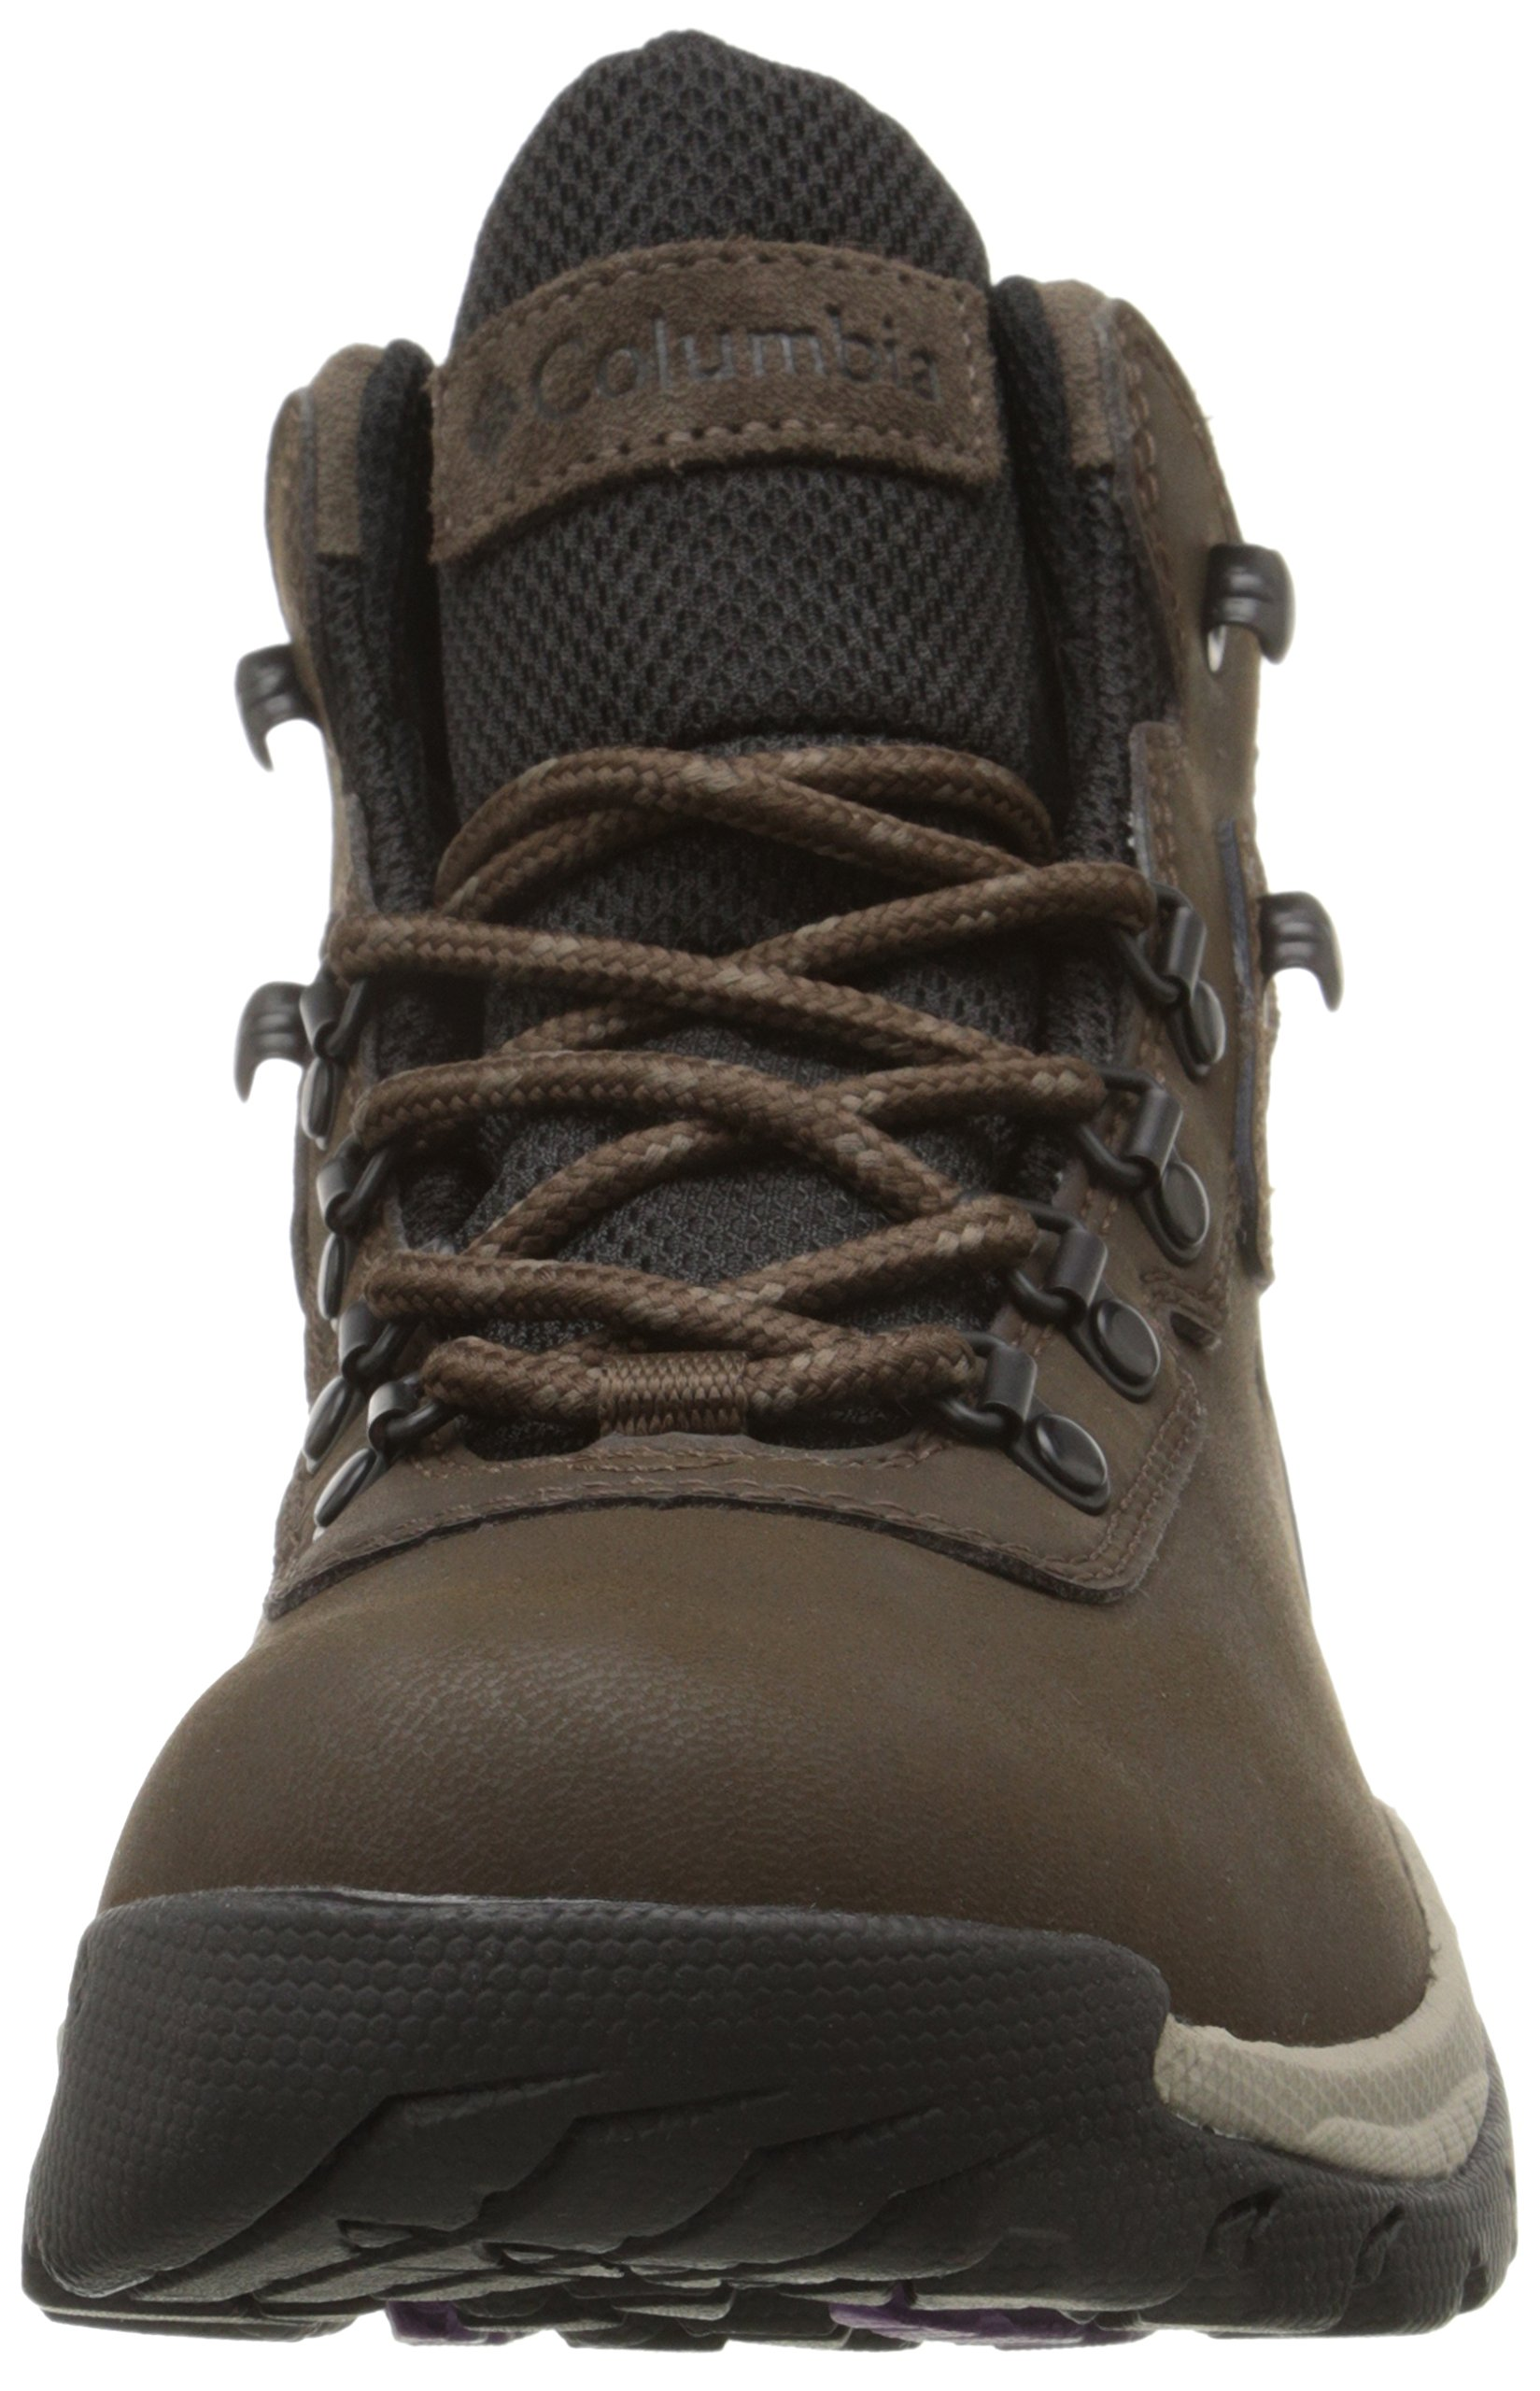 Columbia Women's Newton Ridge Plus Hiking Boot, Cordovan/Crown Jewel, 6 Regular US by Columbia (Image #4)